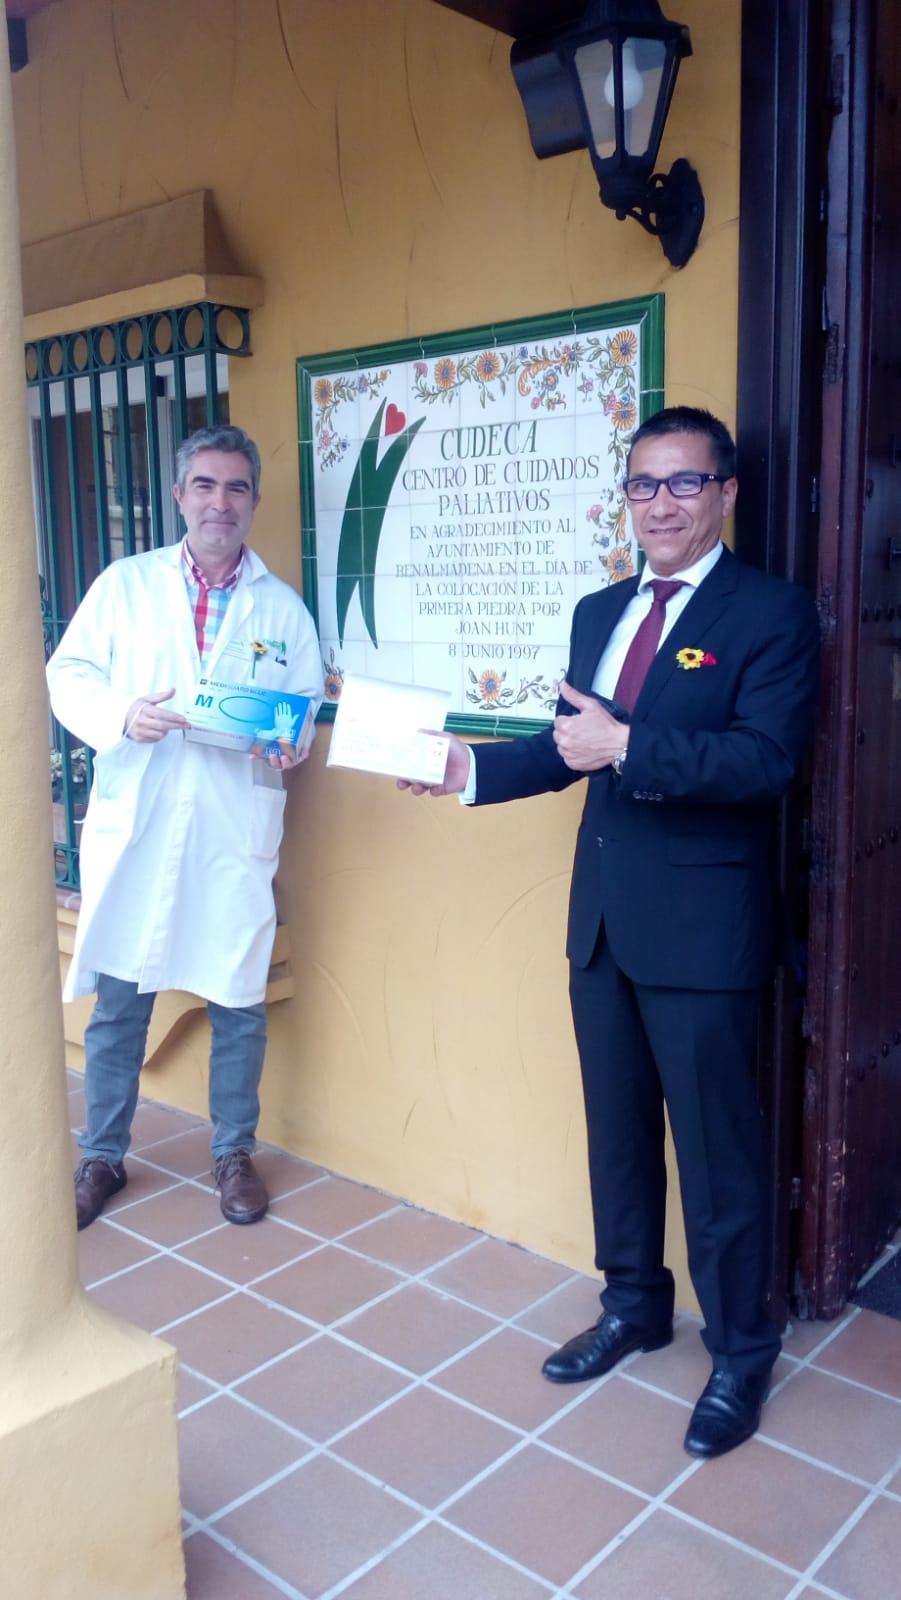 Dalian Huanbohai Energy Trading Center donates thousands of surgical masks & gloves to Cudeca!